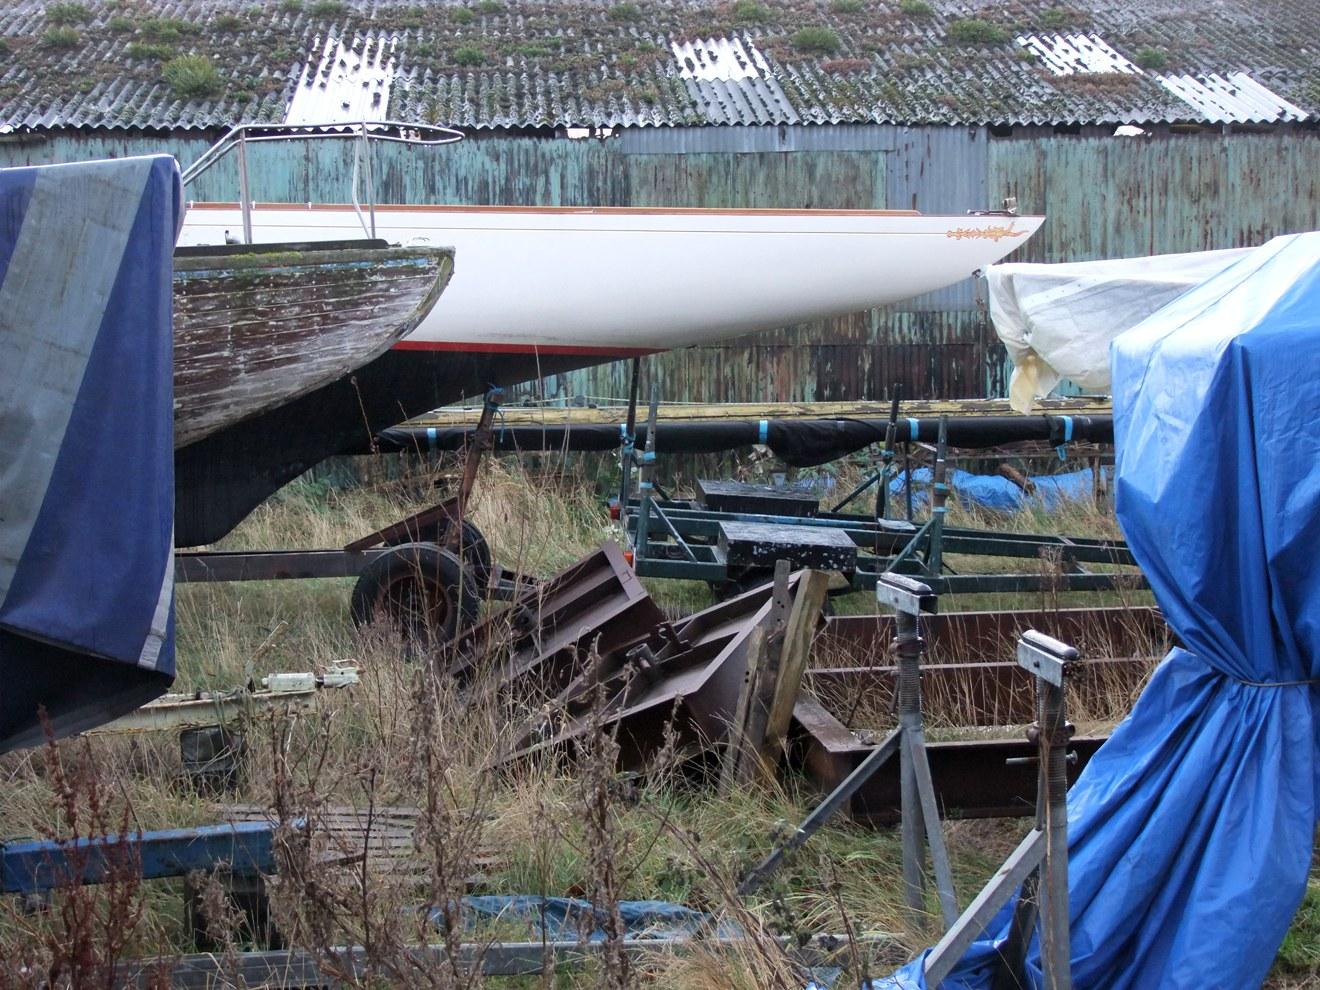 Keadby Lock Alkborough Barton on Humber and Caistor 14